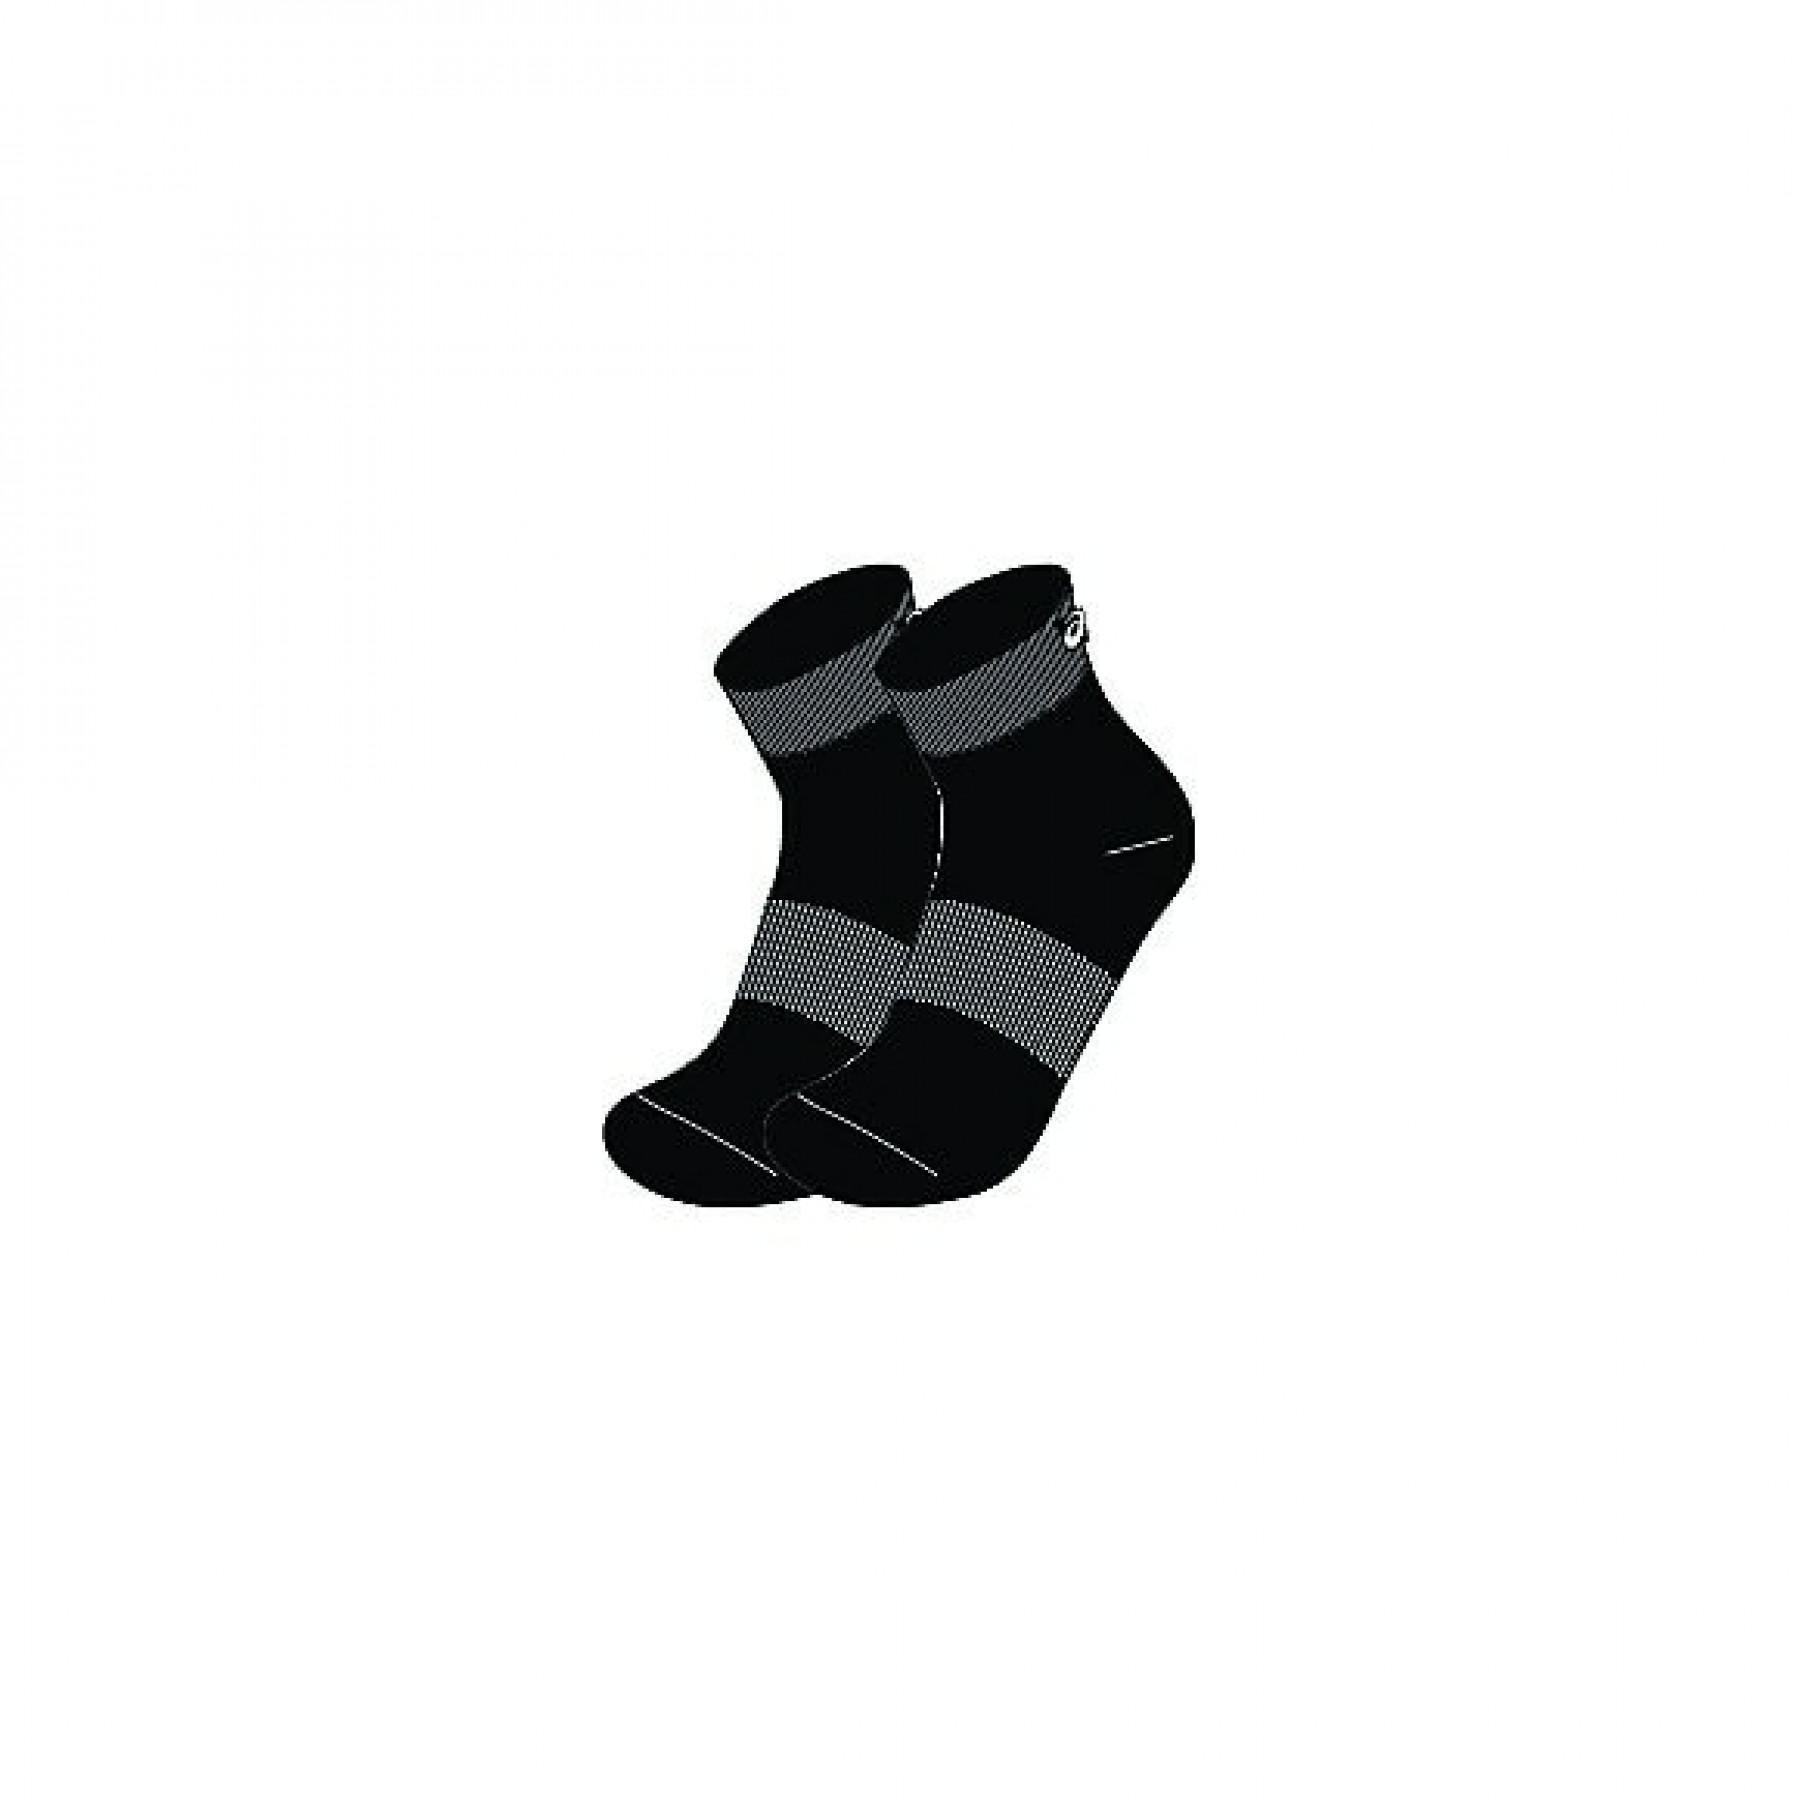 Socks Asics Sport - Lot de 2